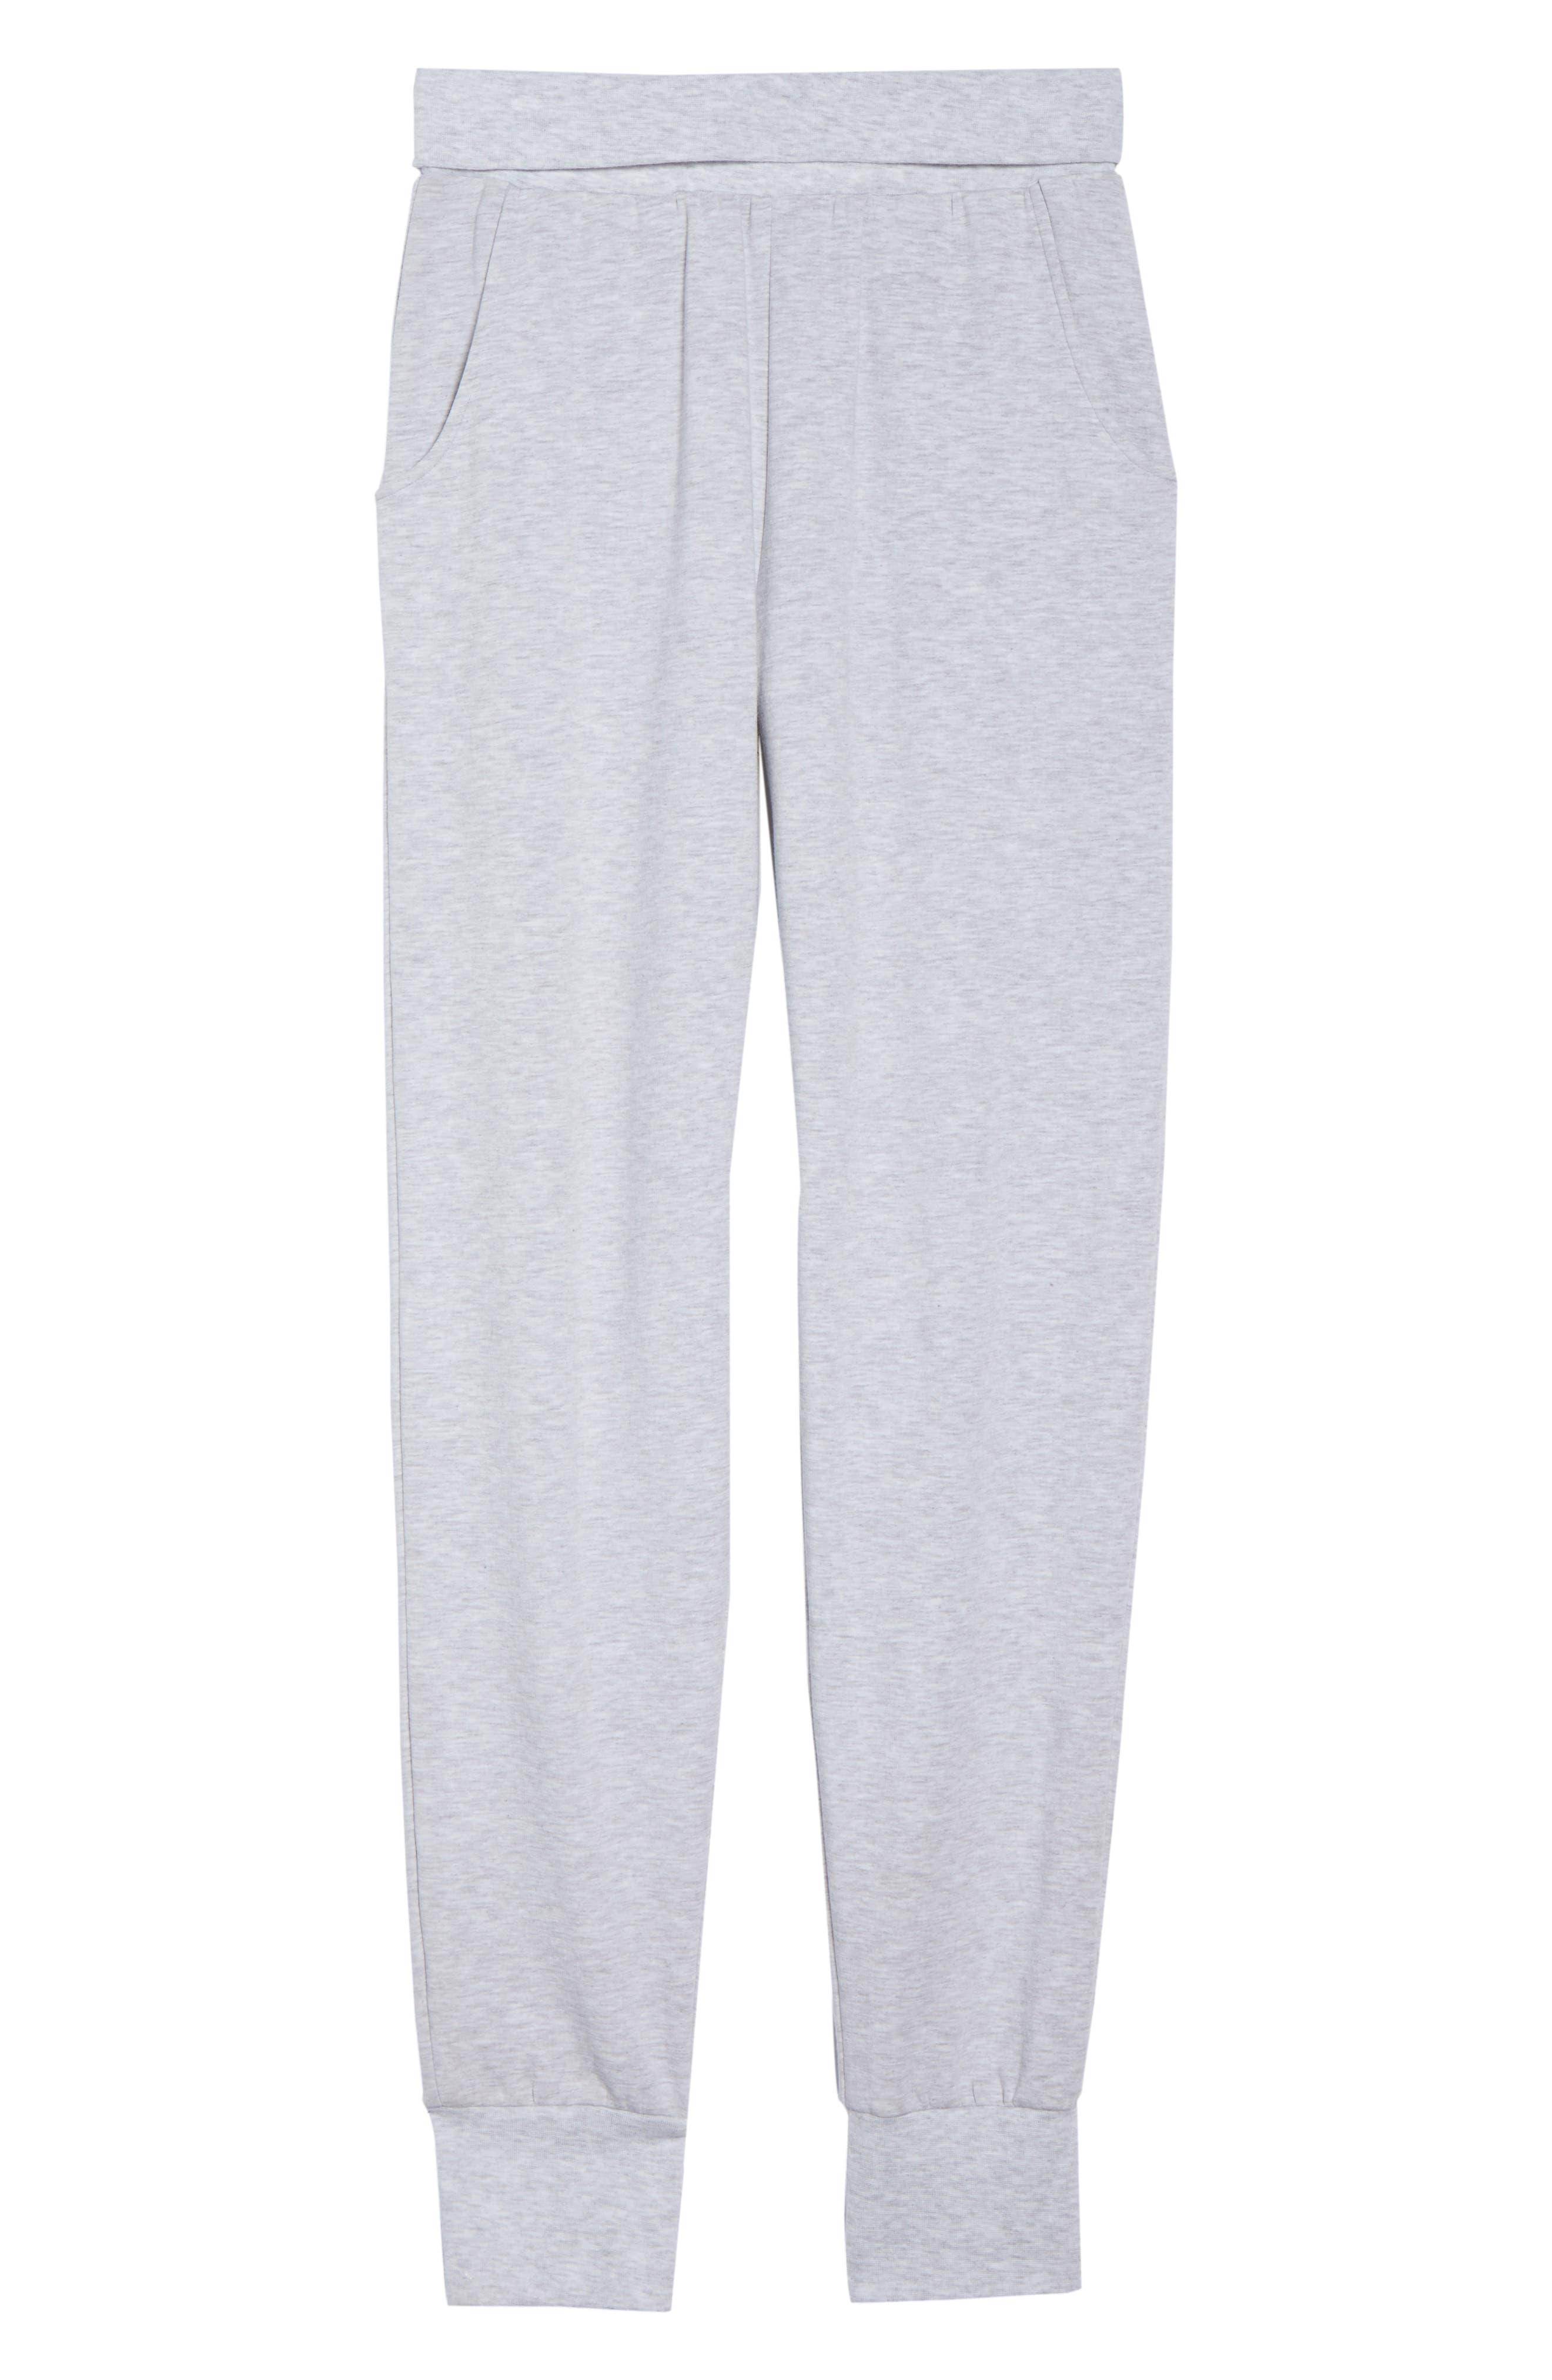 Jogger Pajama Pants,                             Alternate thumbnail 6, color,                             020